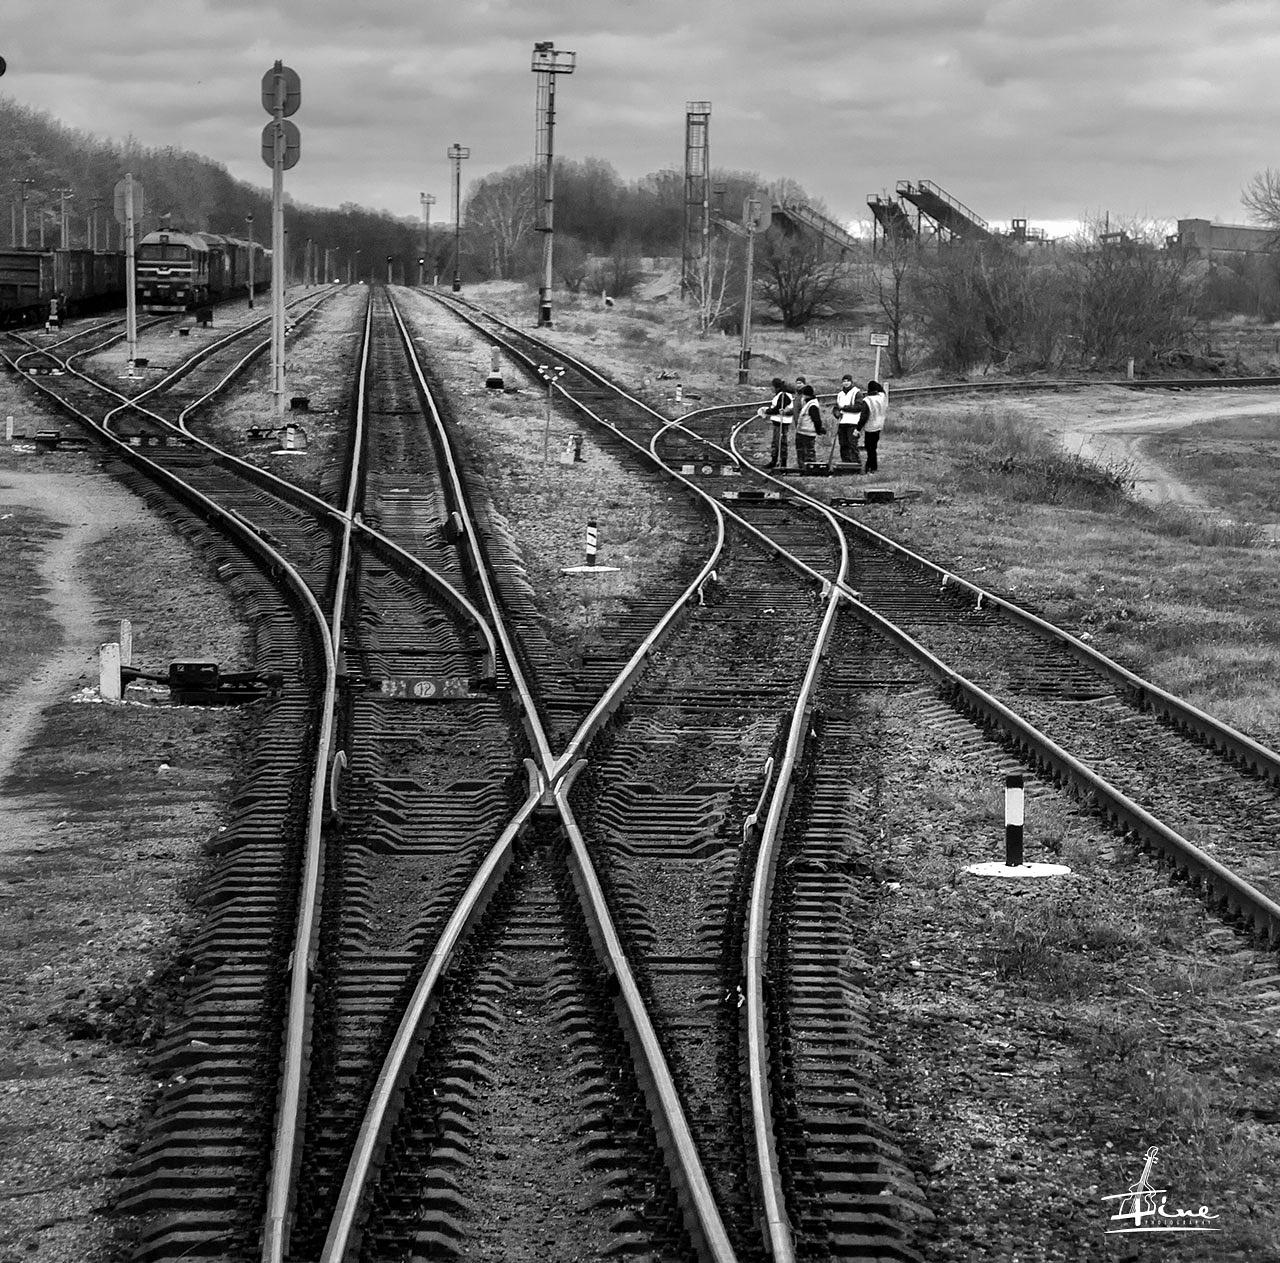 Untitled by Zoriy Fine